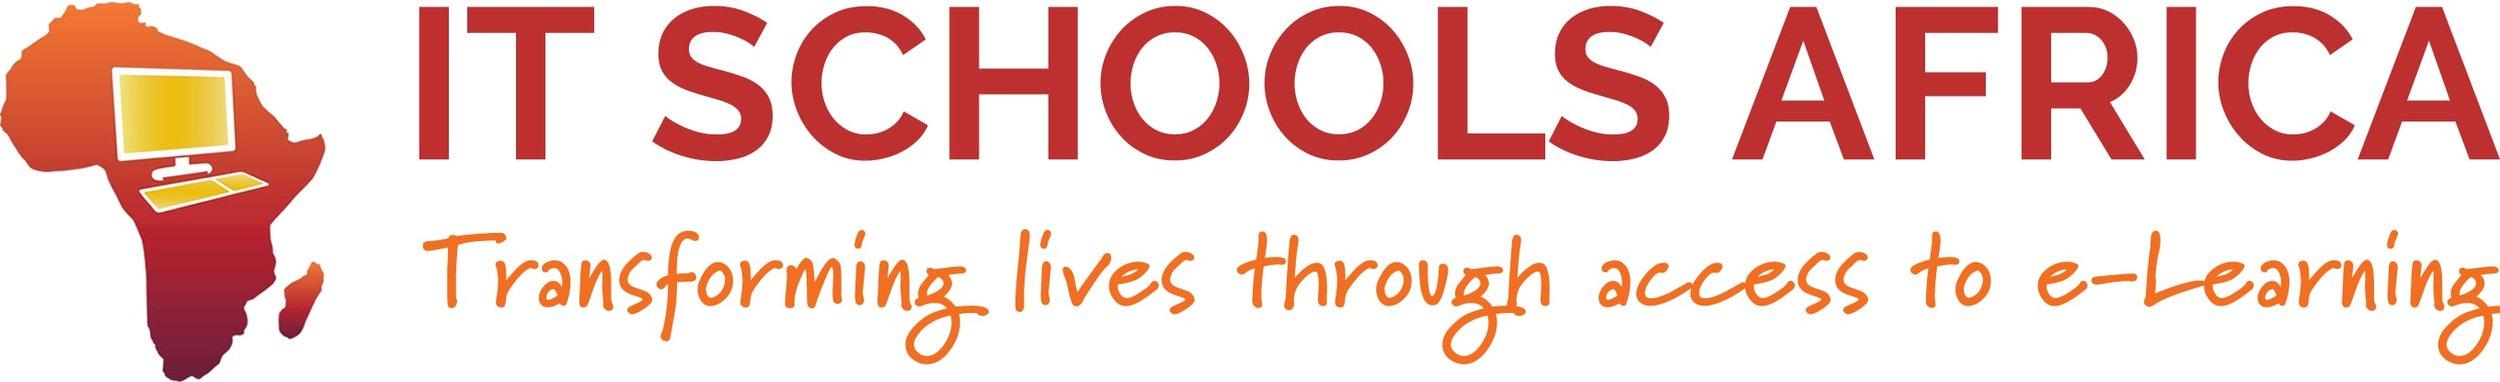 ITSA logo.jpg